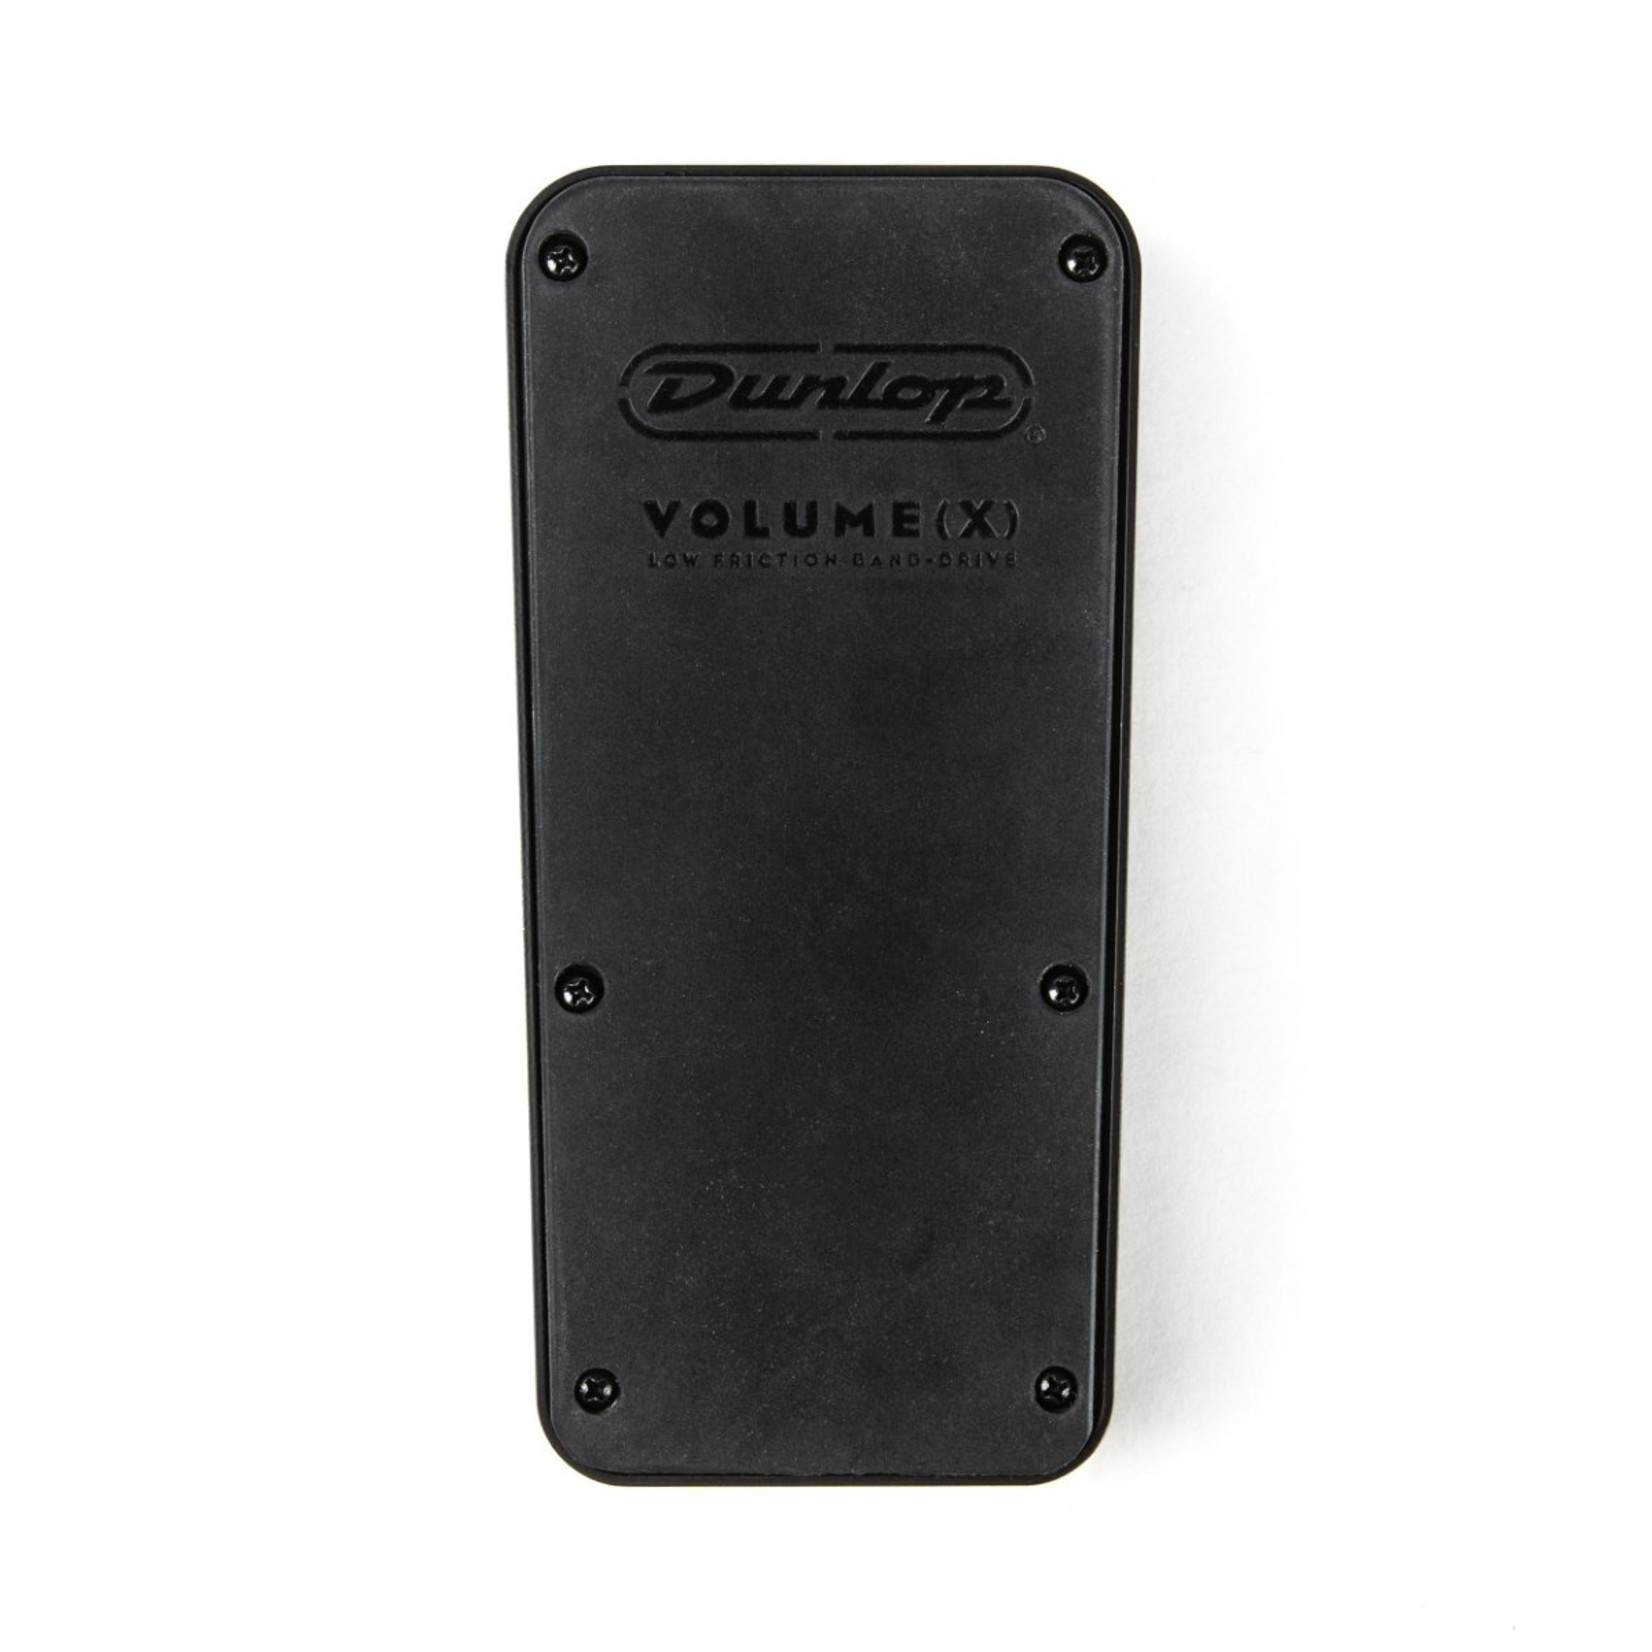 Dunlop Dunlop DVP5 Volume (X) 8 Pedal